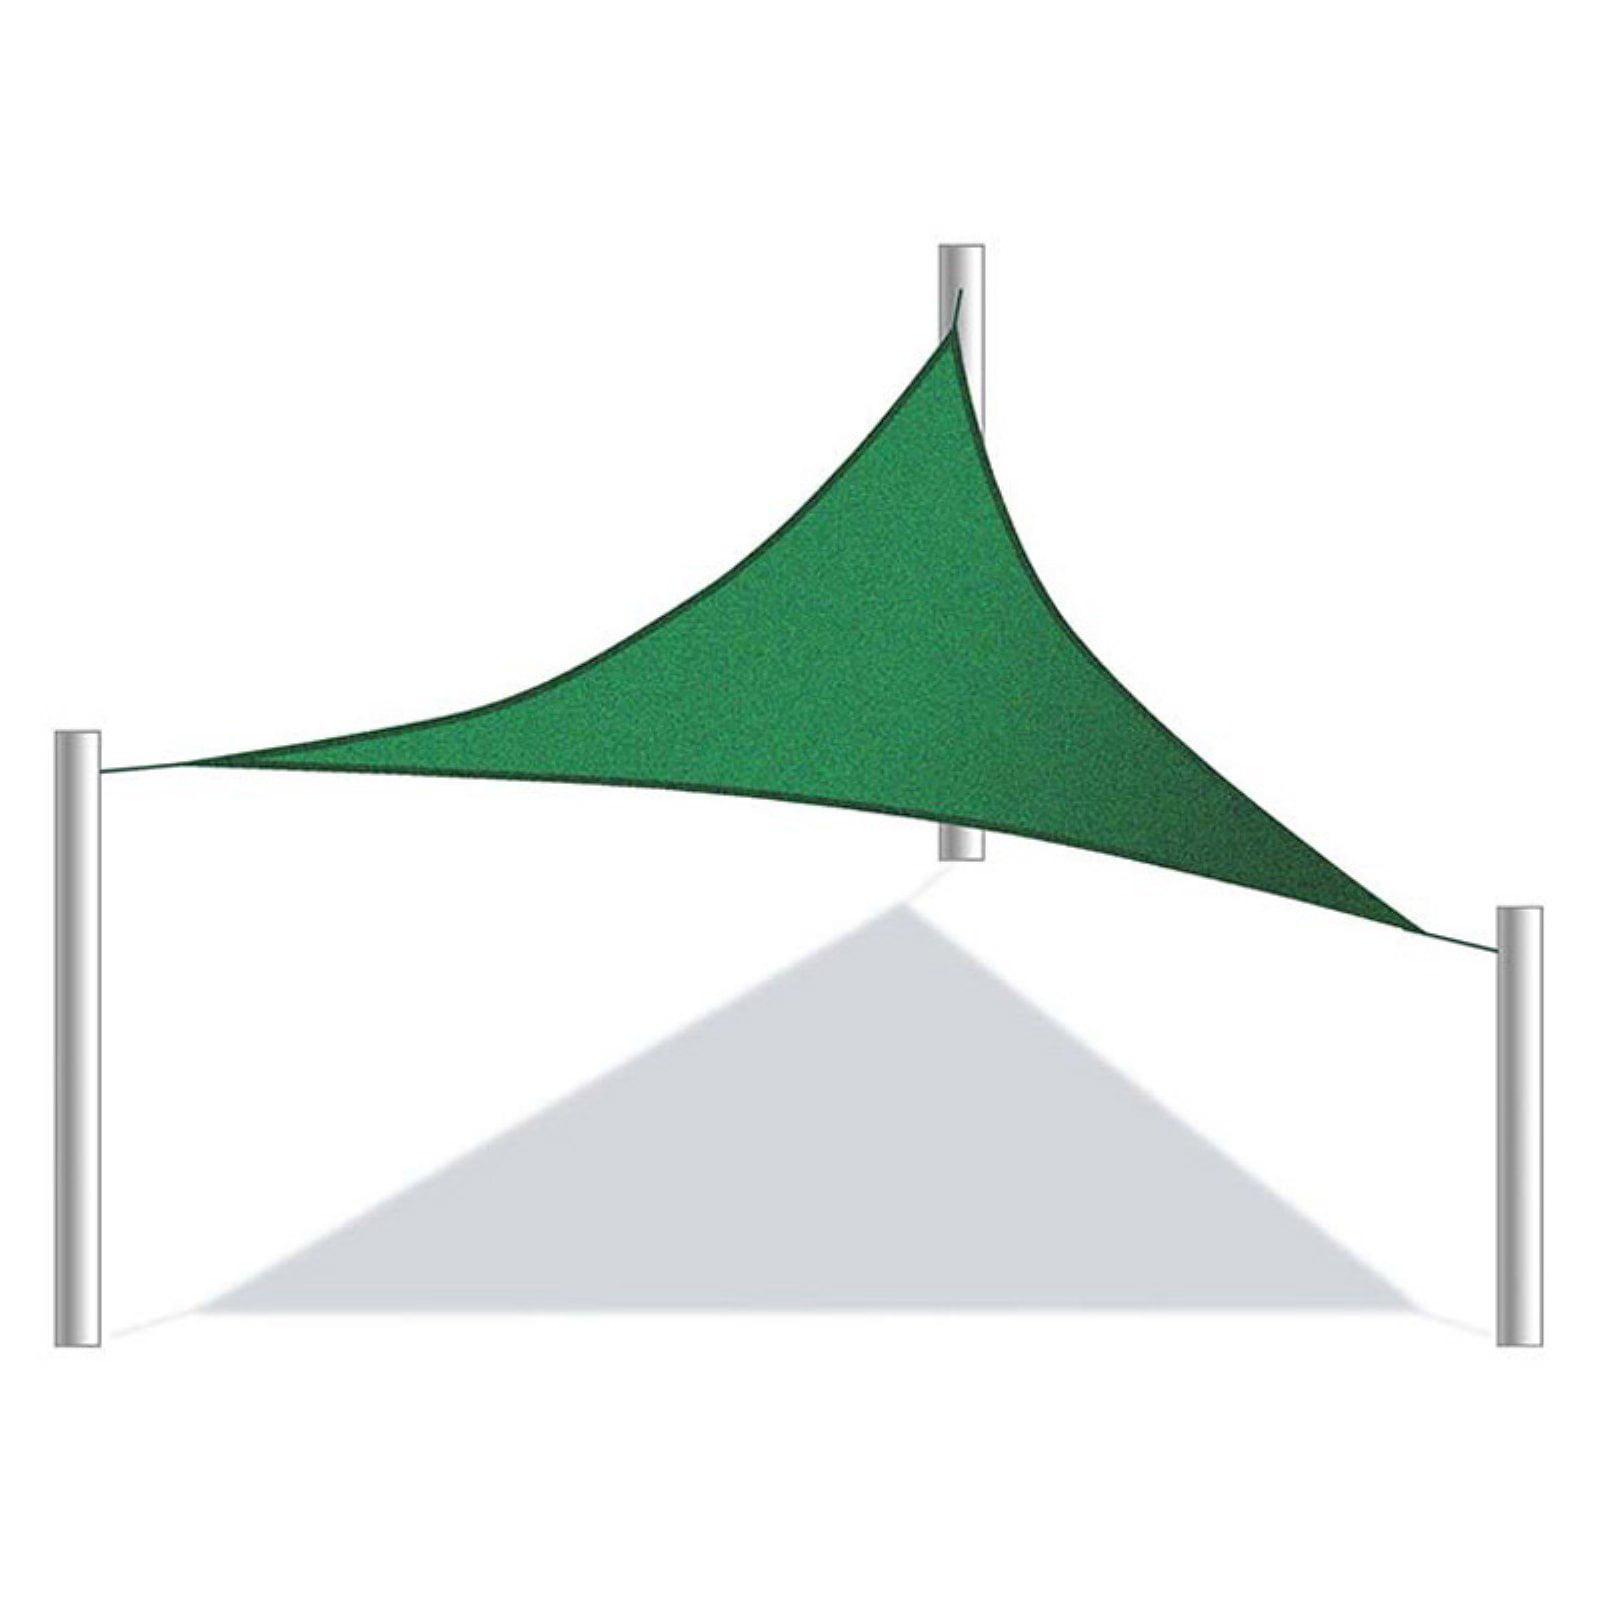 ALEKO 16X16X16 Foot Triangular Sun Sail Shade Net UV Block Fabric